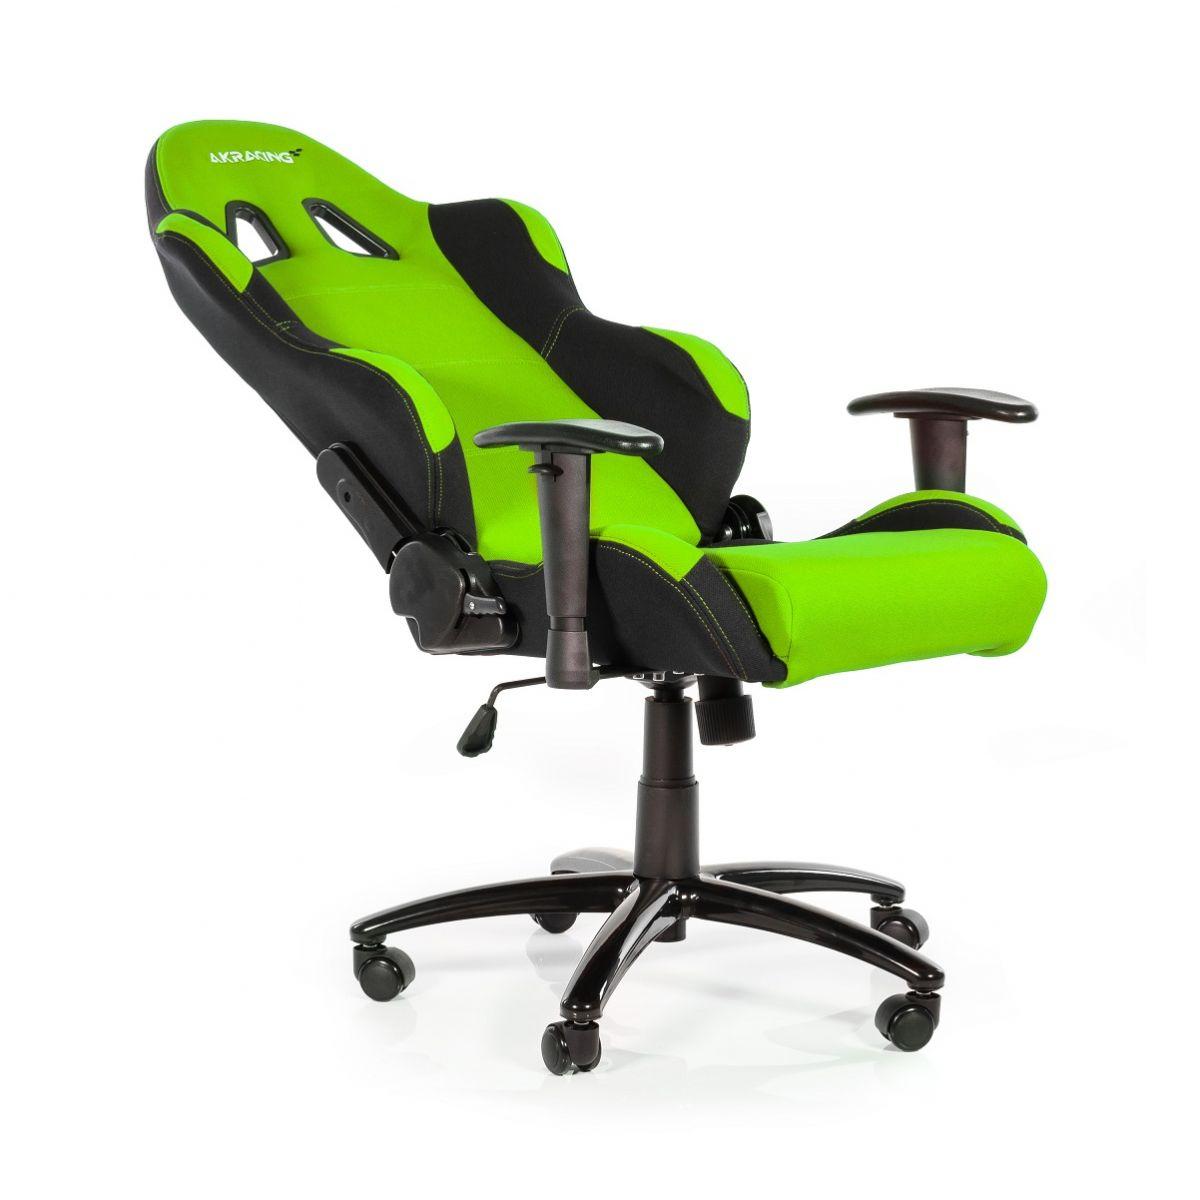 Cadeira AKRacing Prime Preto/Verde AK-K7018-BG - AKRacing